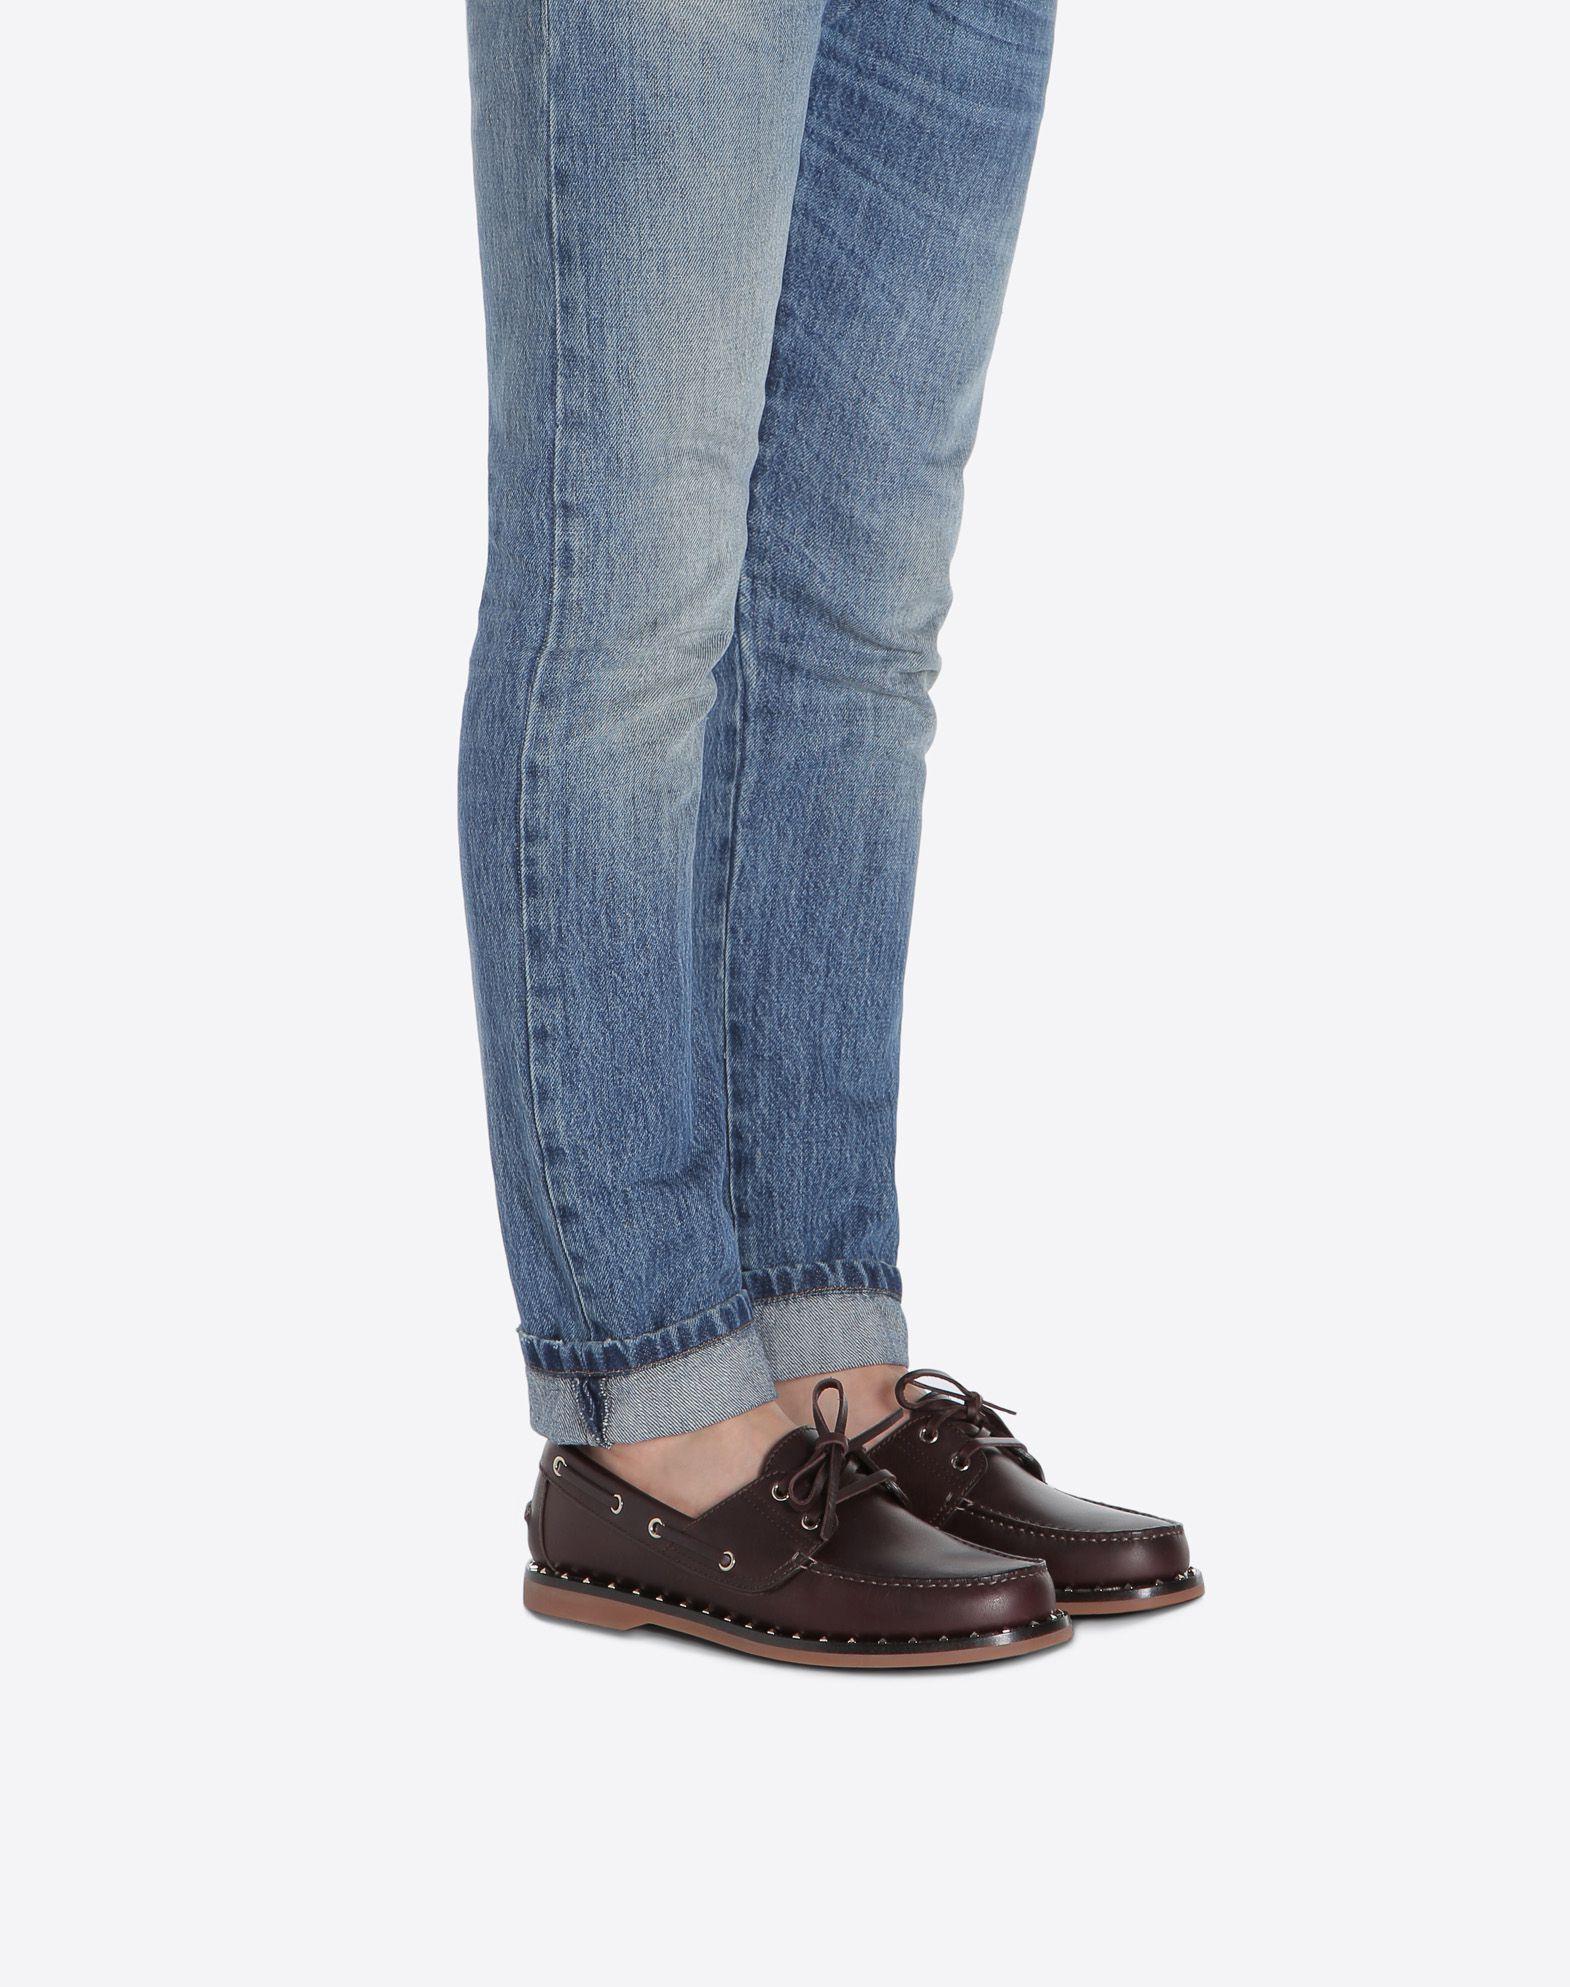 VALENTINO GARAVANI UOMO Soul Rockstud Boat shoes LOAFERS U a